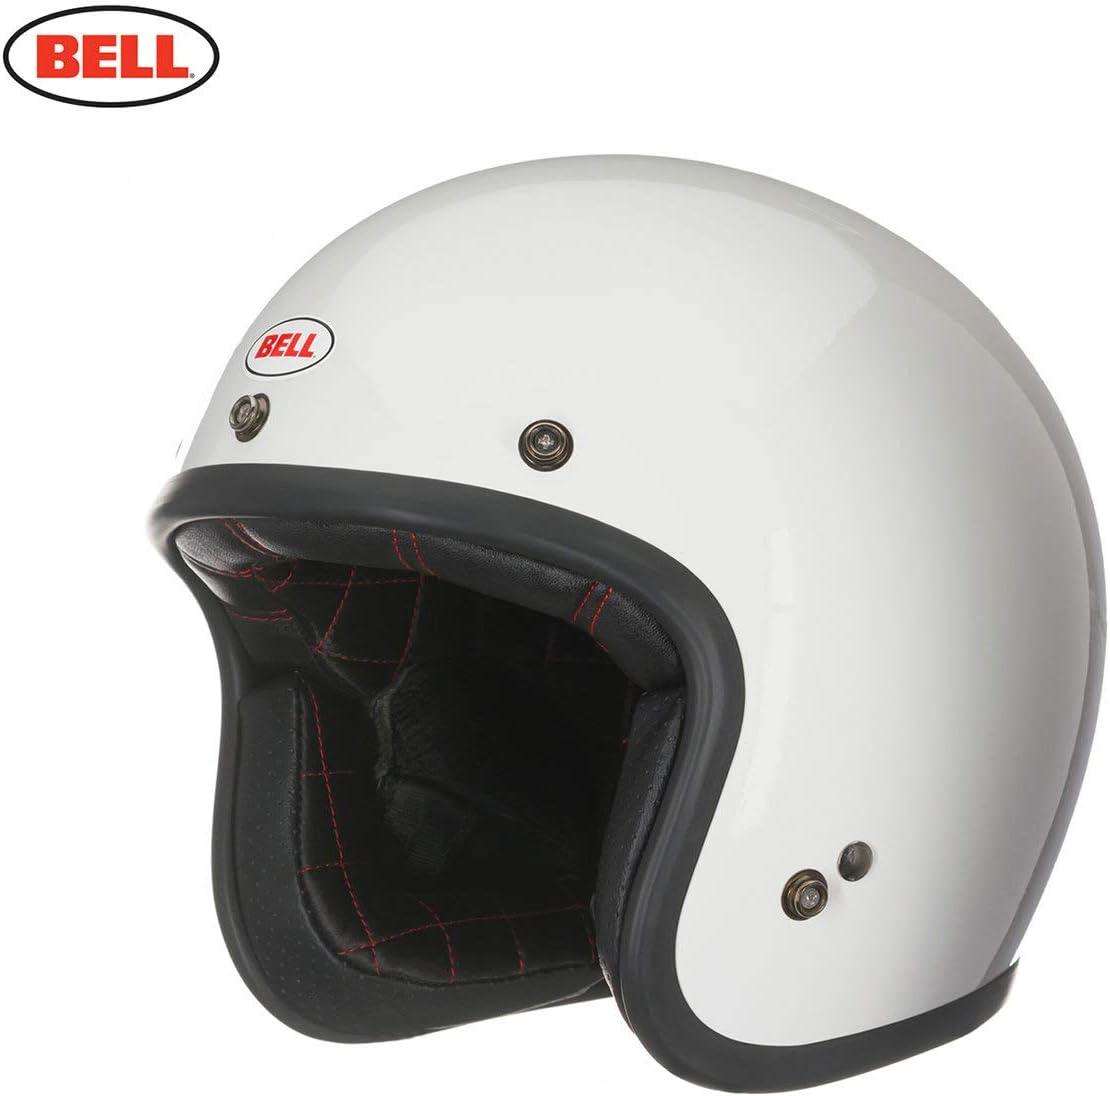 BELL Jet Custom 500 DLX Pulse Gloss Noir Rouge